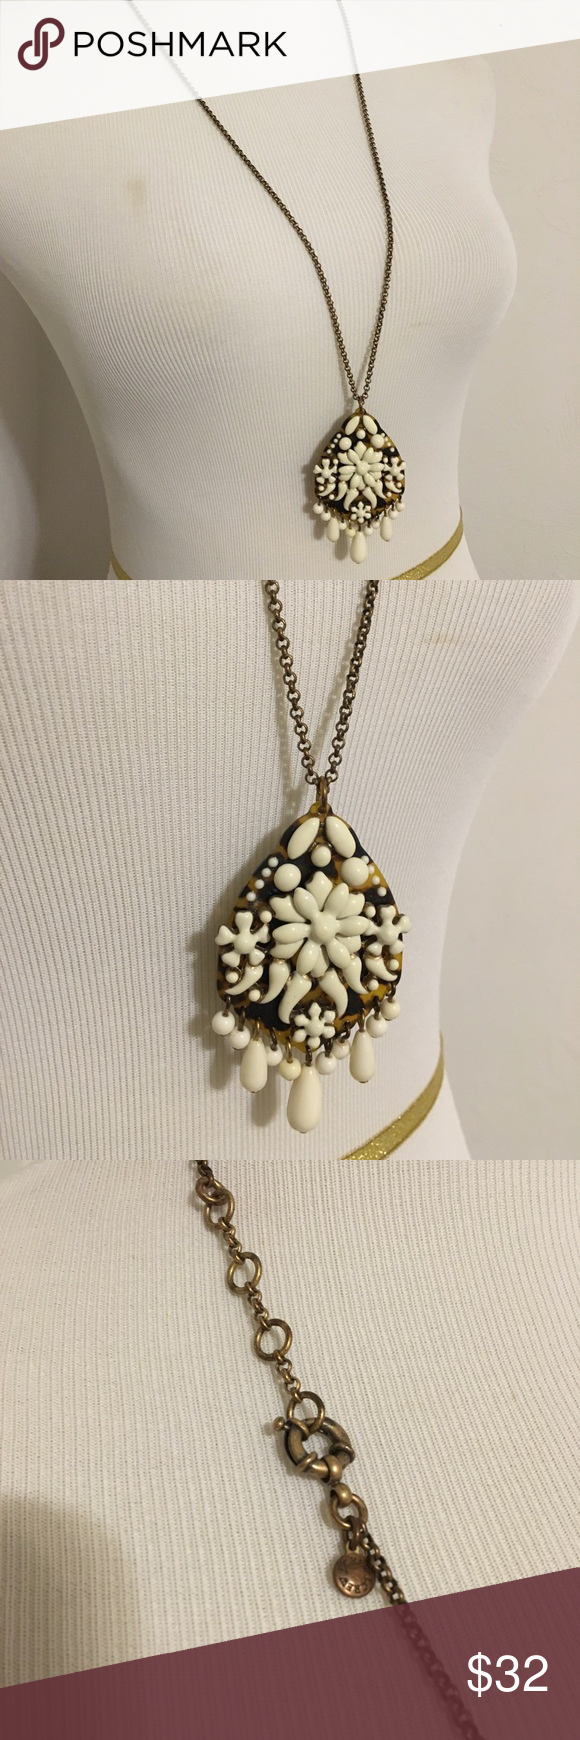 J Crew crystal fiesta pendant necklace My Posh Picks Pinterest